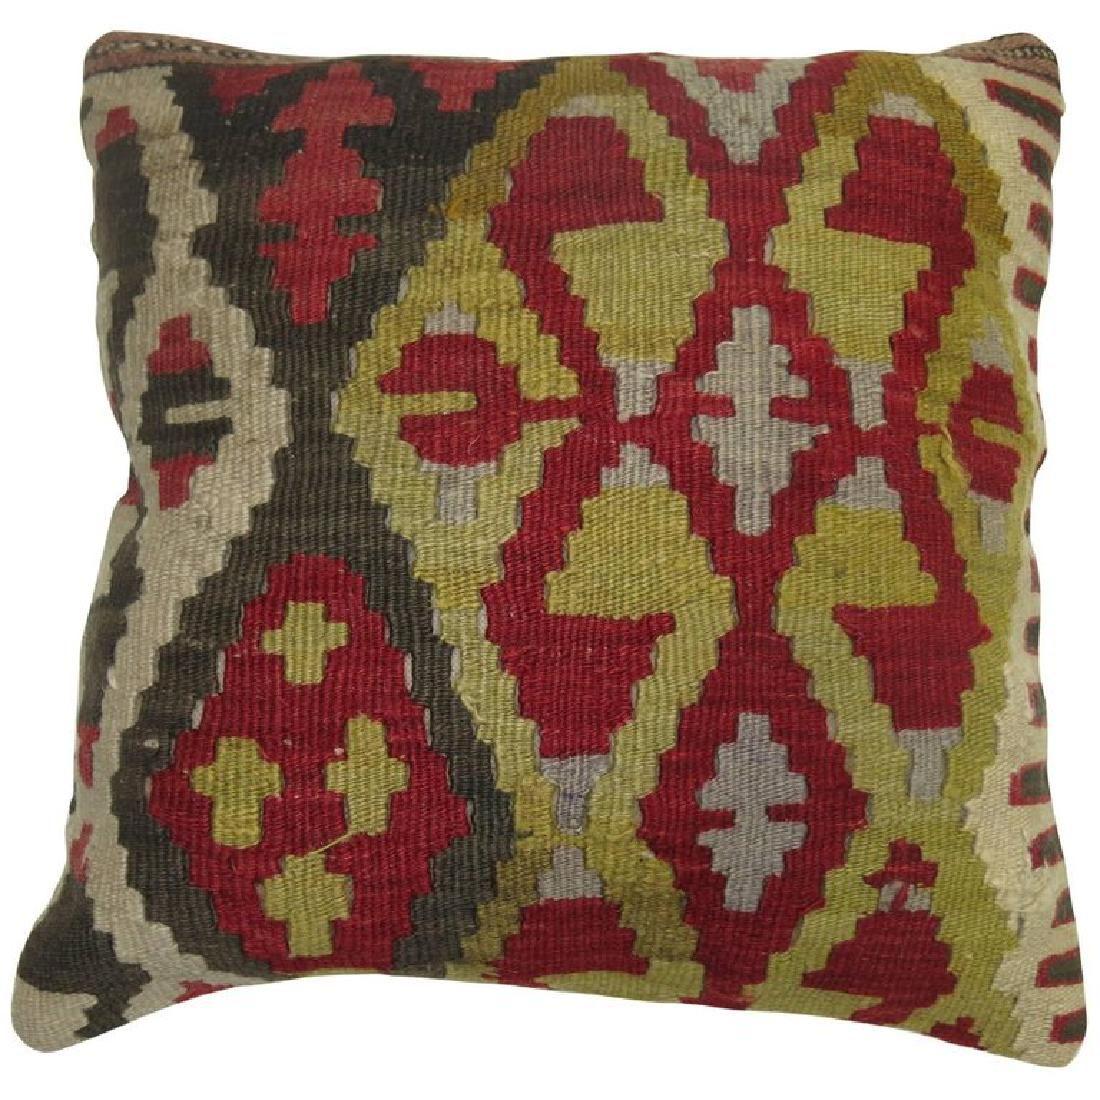 Turkish Kilim Rug Pillow 1.4x1.4x1.4